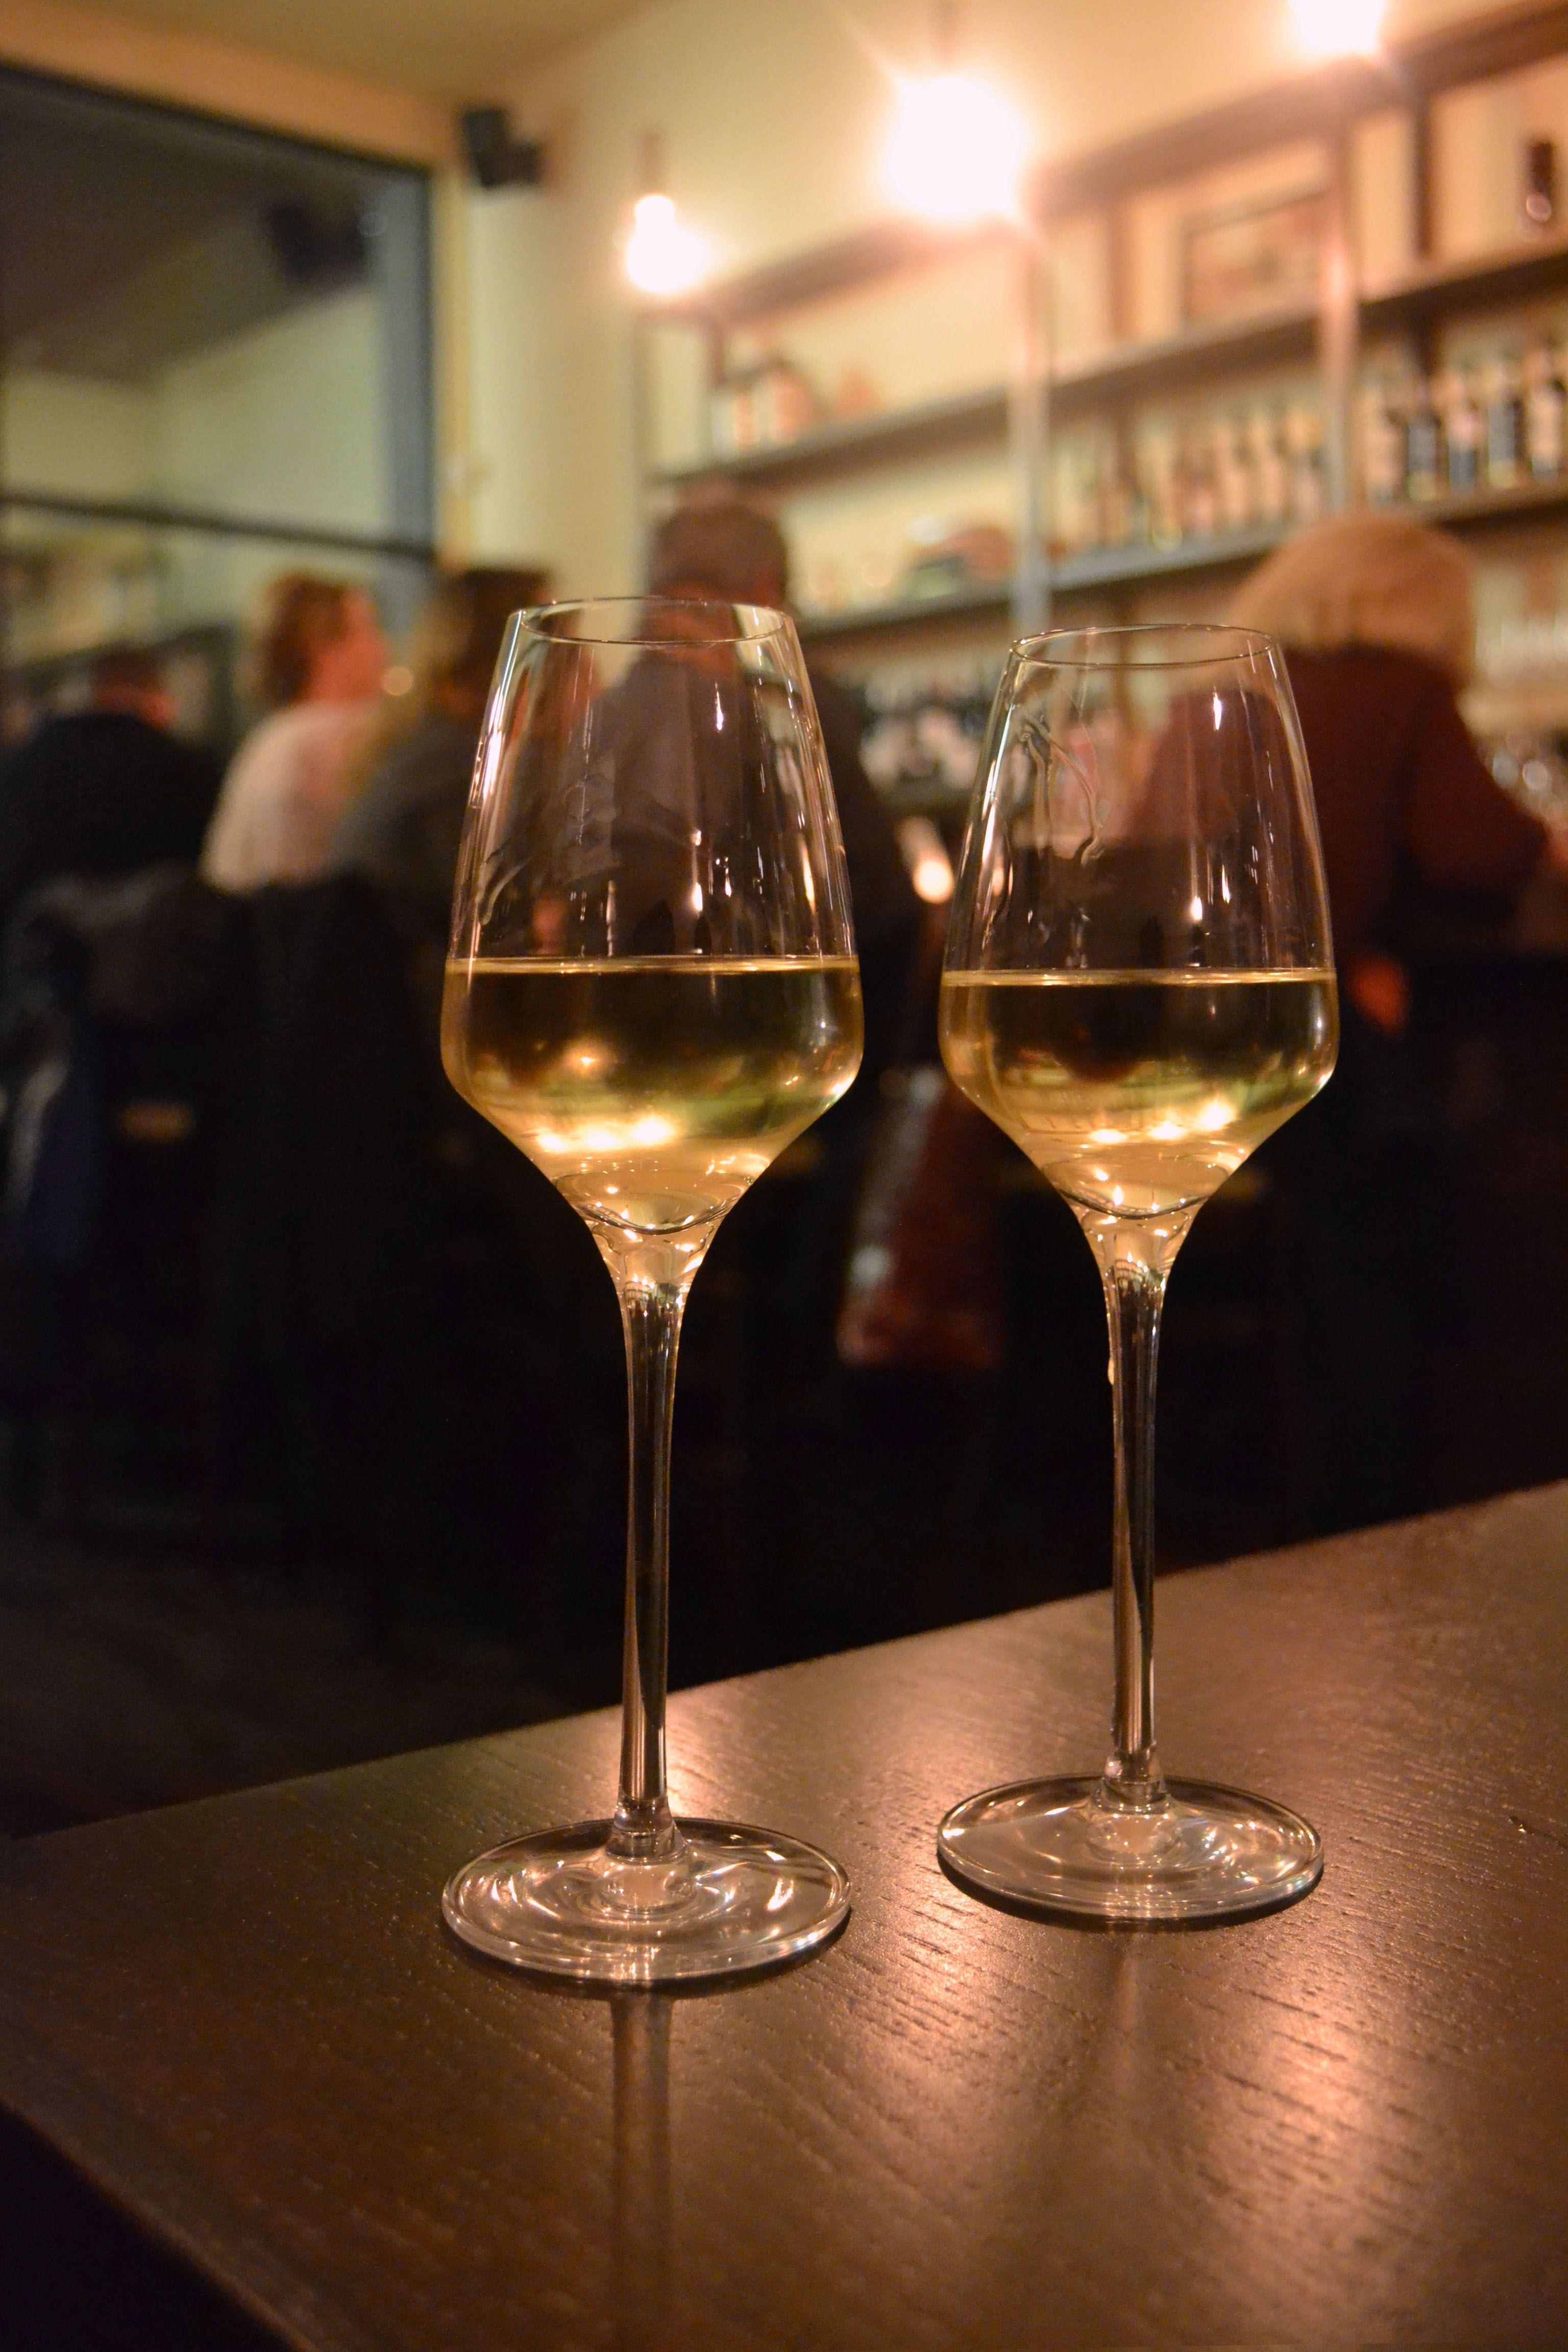 Best Bars in Chicago: 6 Best Wine Bars